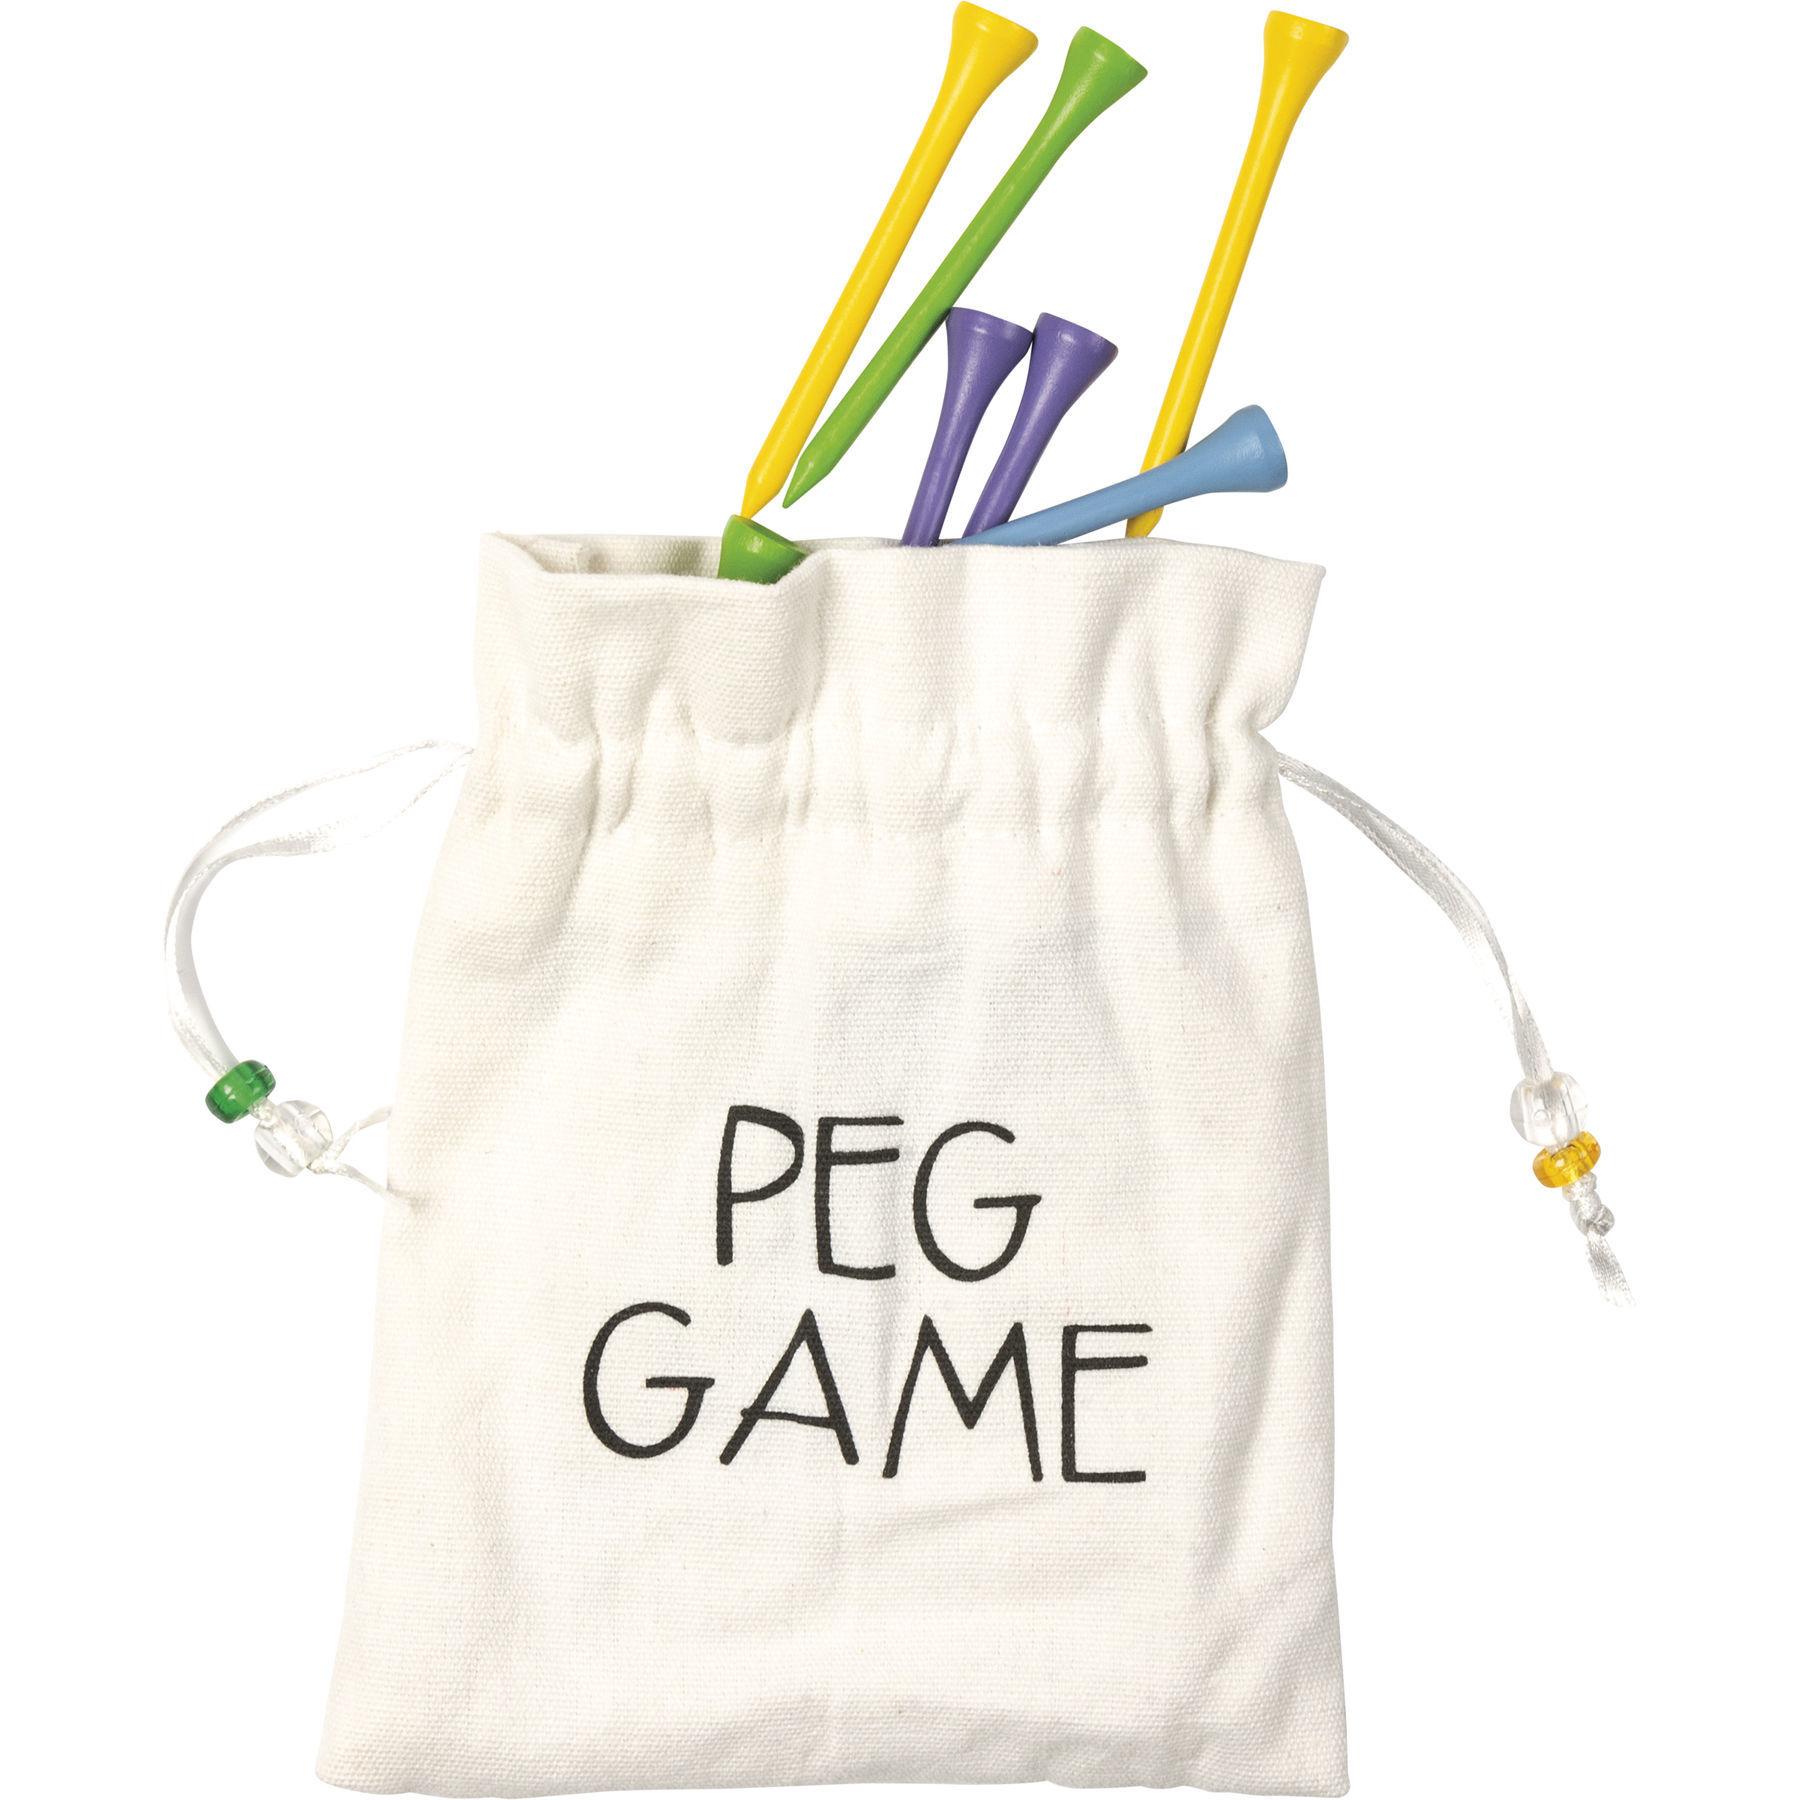 Peg Desk Game by Primitives by Kathy